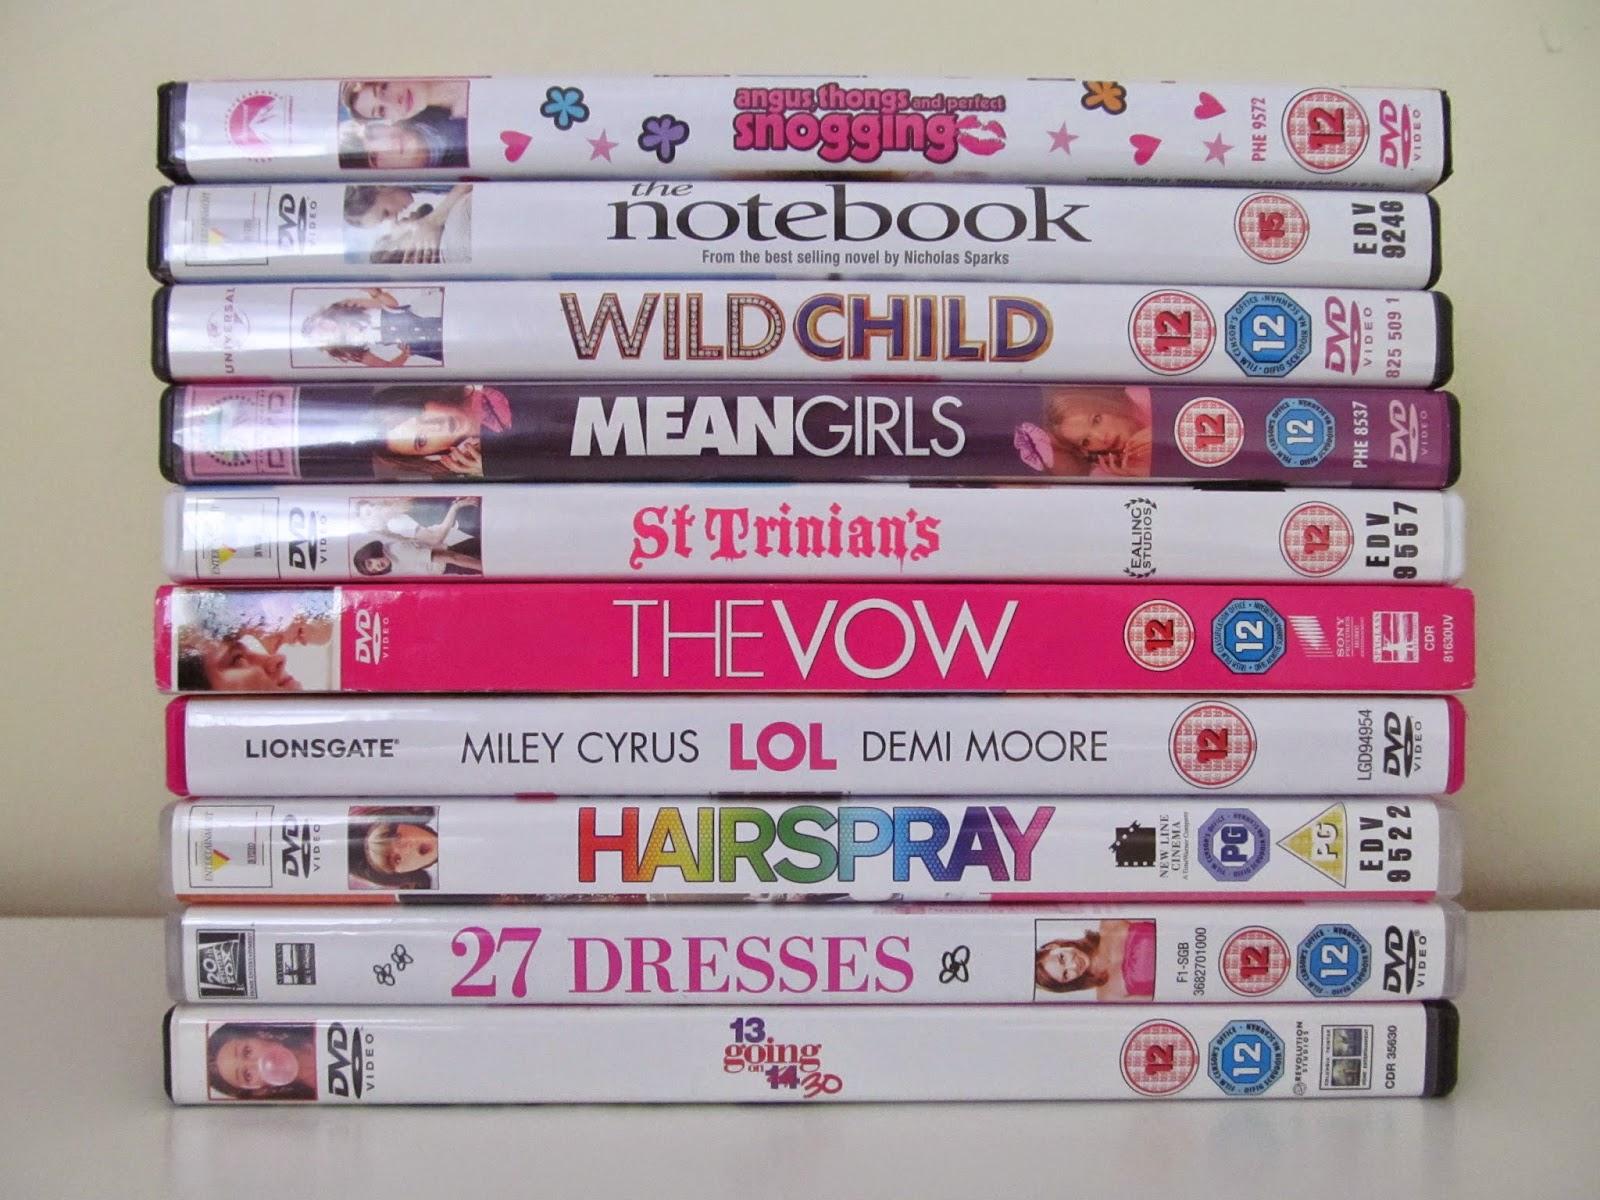 Top 10 teen movies 2008 merveille cette